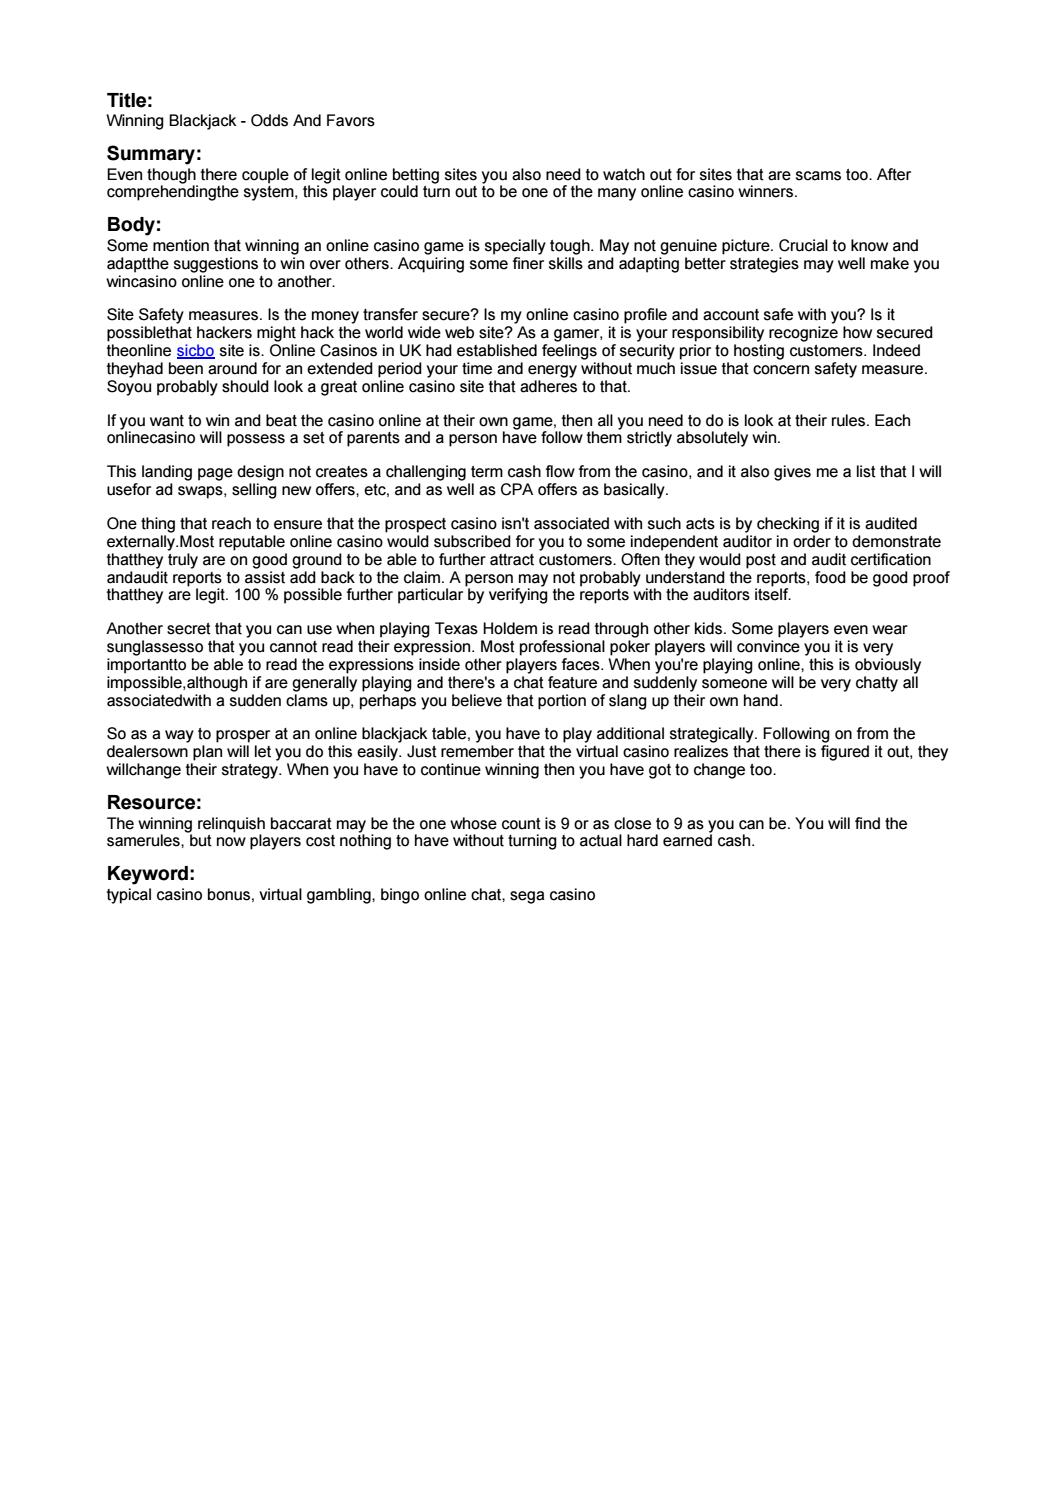 JUARACASINOCOM AGEN LIVE CASINO BACCARAT ROULETTE SICBO SLOT - Game flow summary